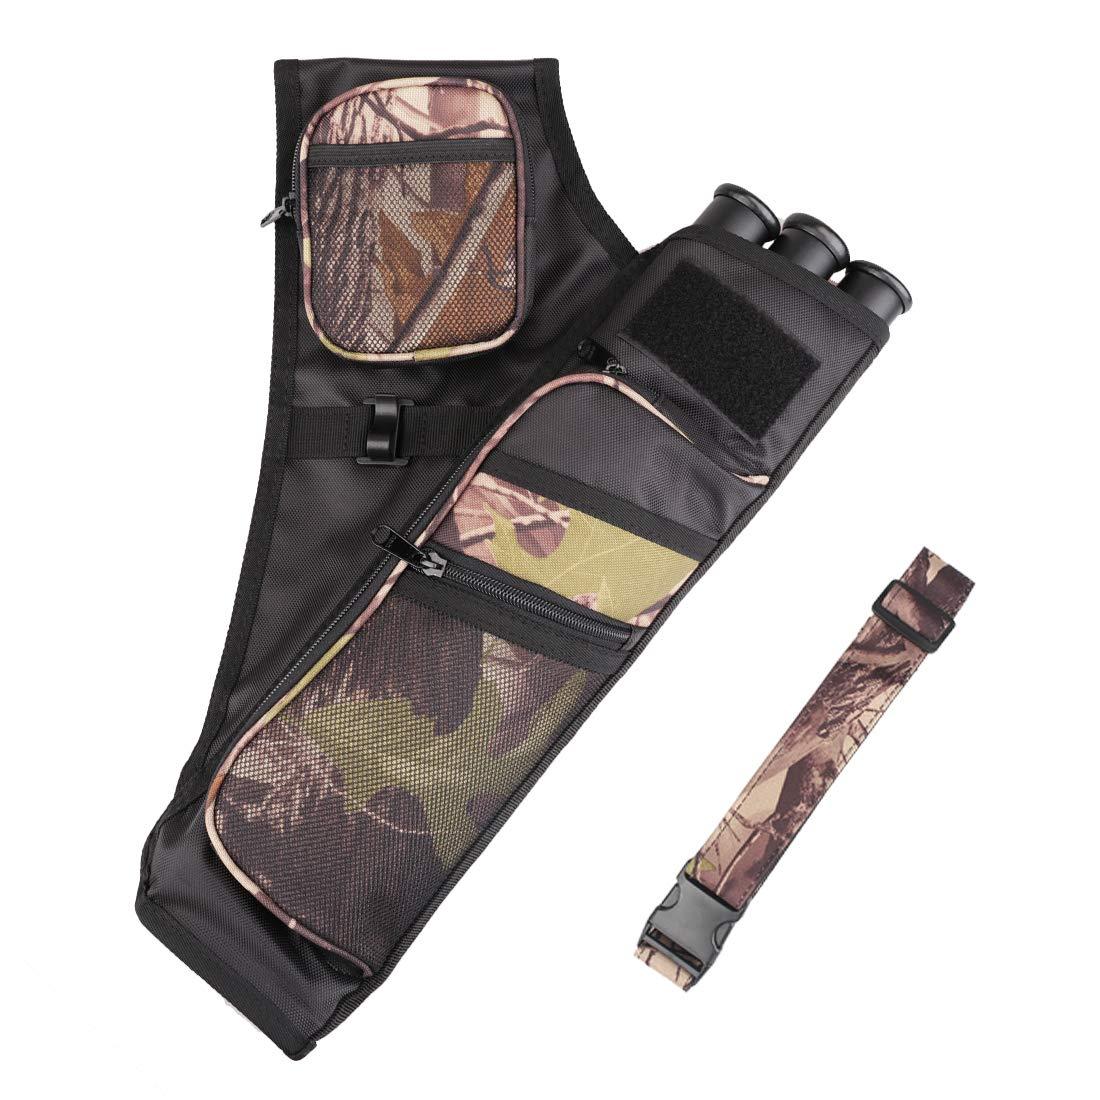 Kratarc 3-Tubes Hip Quiver Waist Hanged Camouflage Arrow Archery Carry Bag with Pockets Adjustable Belt (Camo)